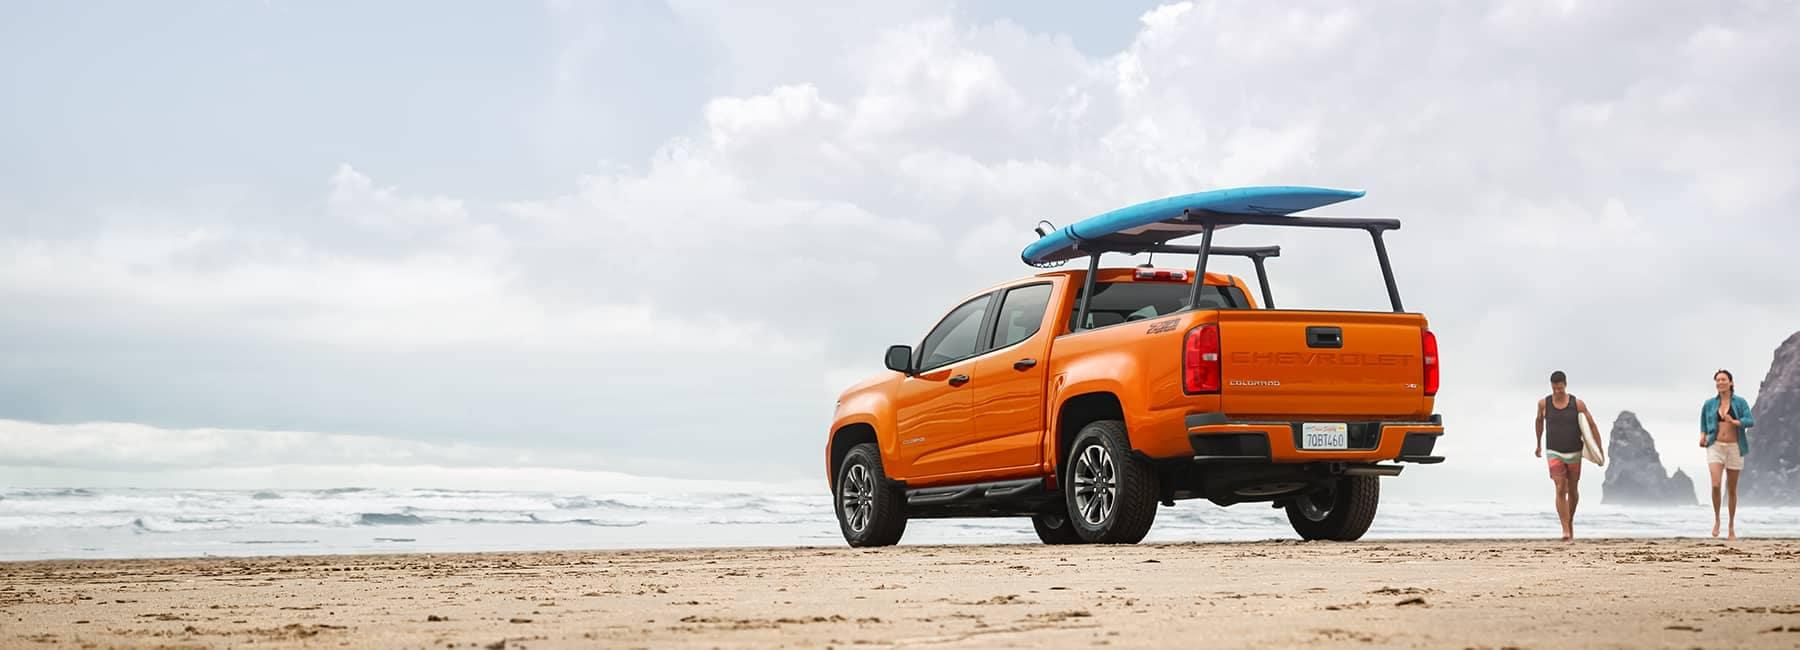 Orange 2020 Chevrolet Colorado on the Beach